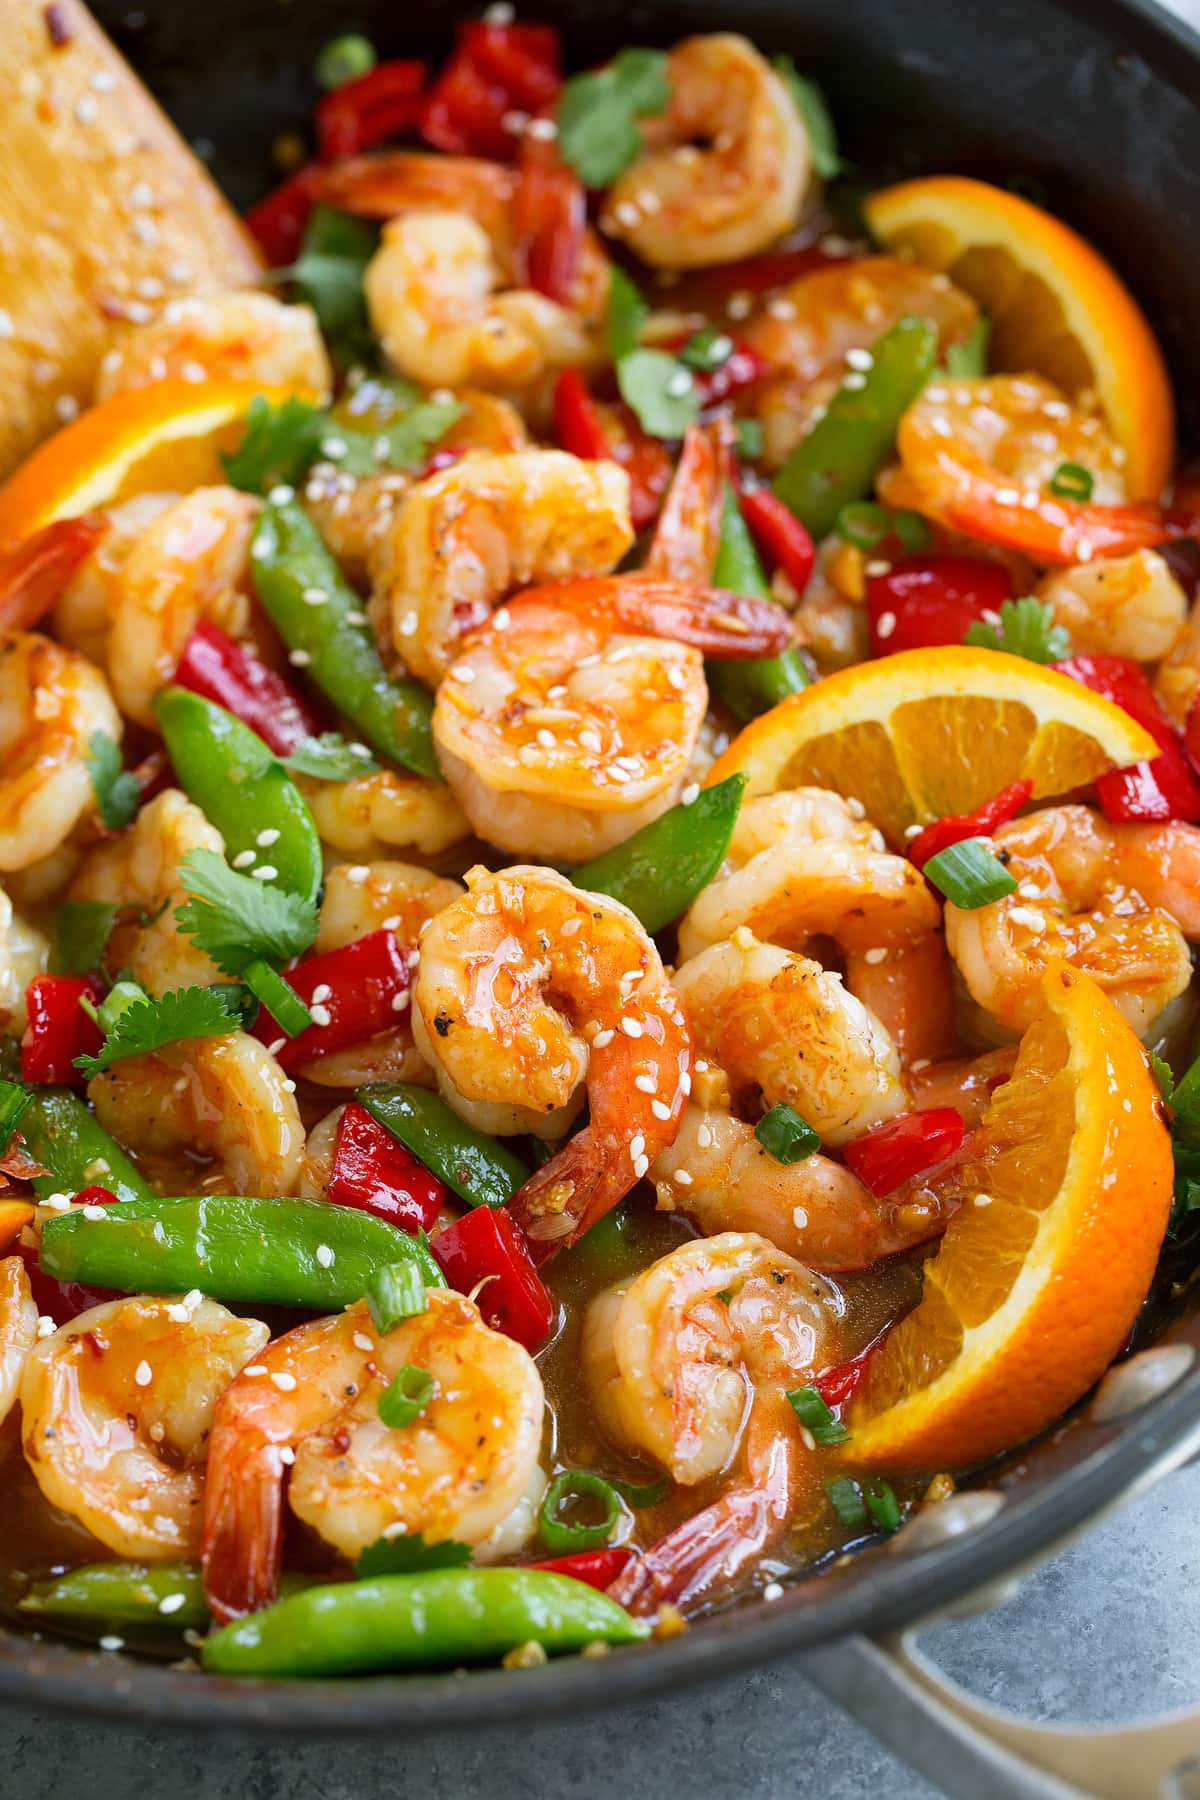 Orange Garlic Shrimp finished recipe shown in skillet